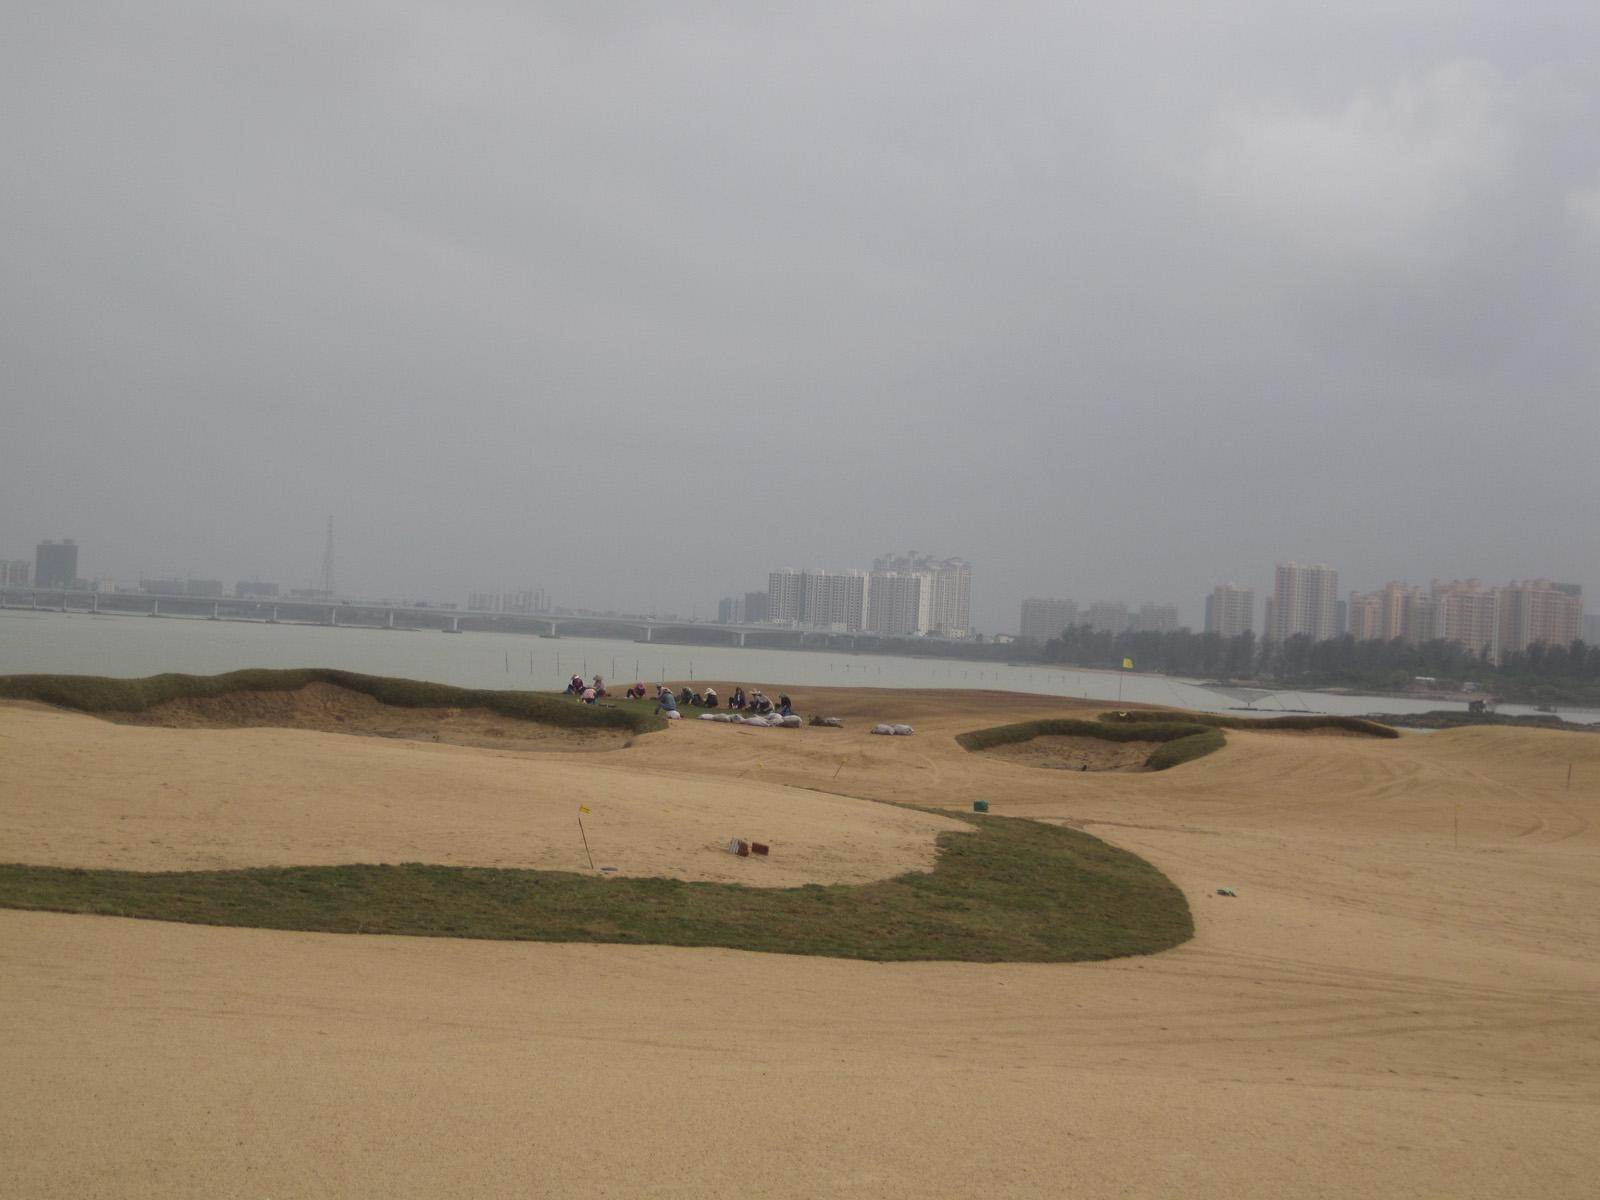 Final grassing at Tom Doak's Simapo Island in Hainan, China.